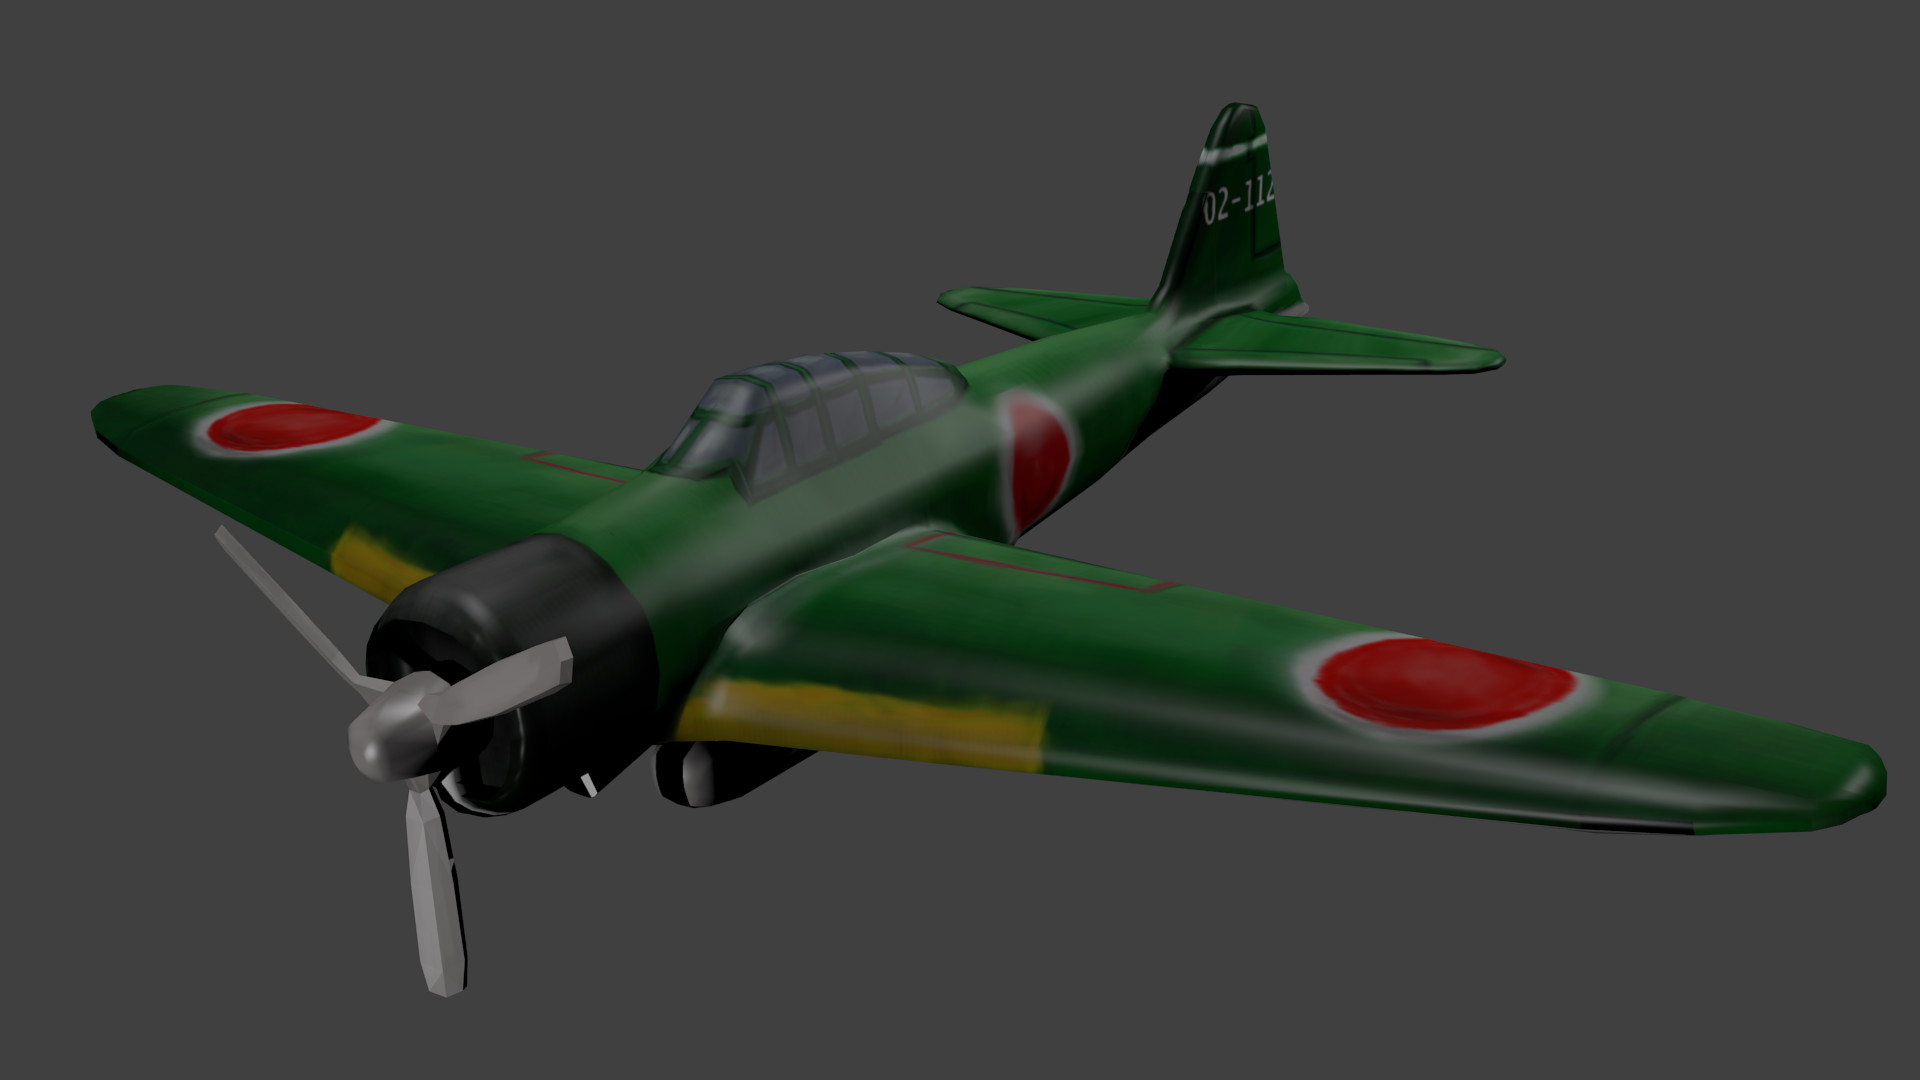 zeroplane1.png